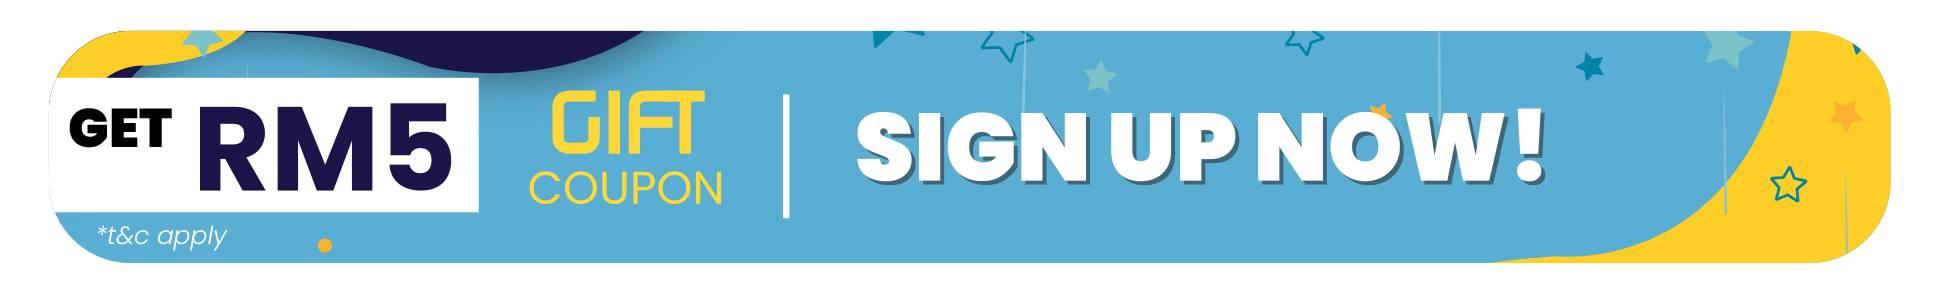 Sign up now & Get RM5 Discount Coupon